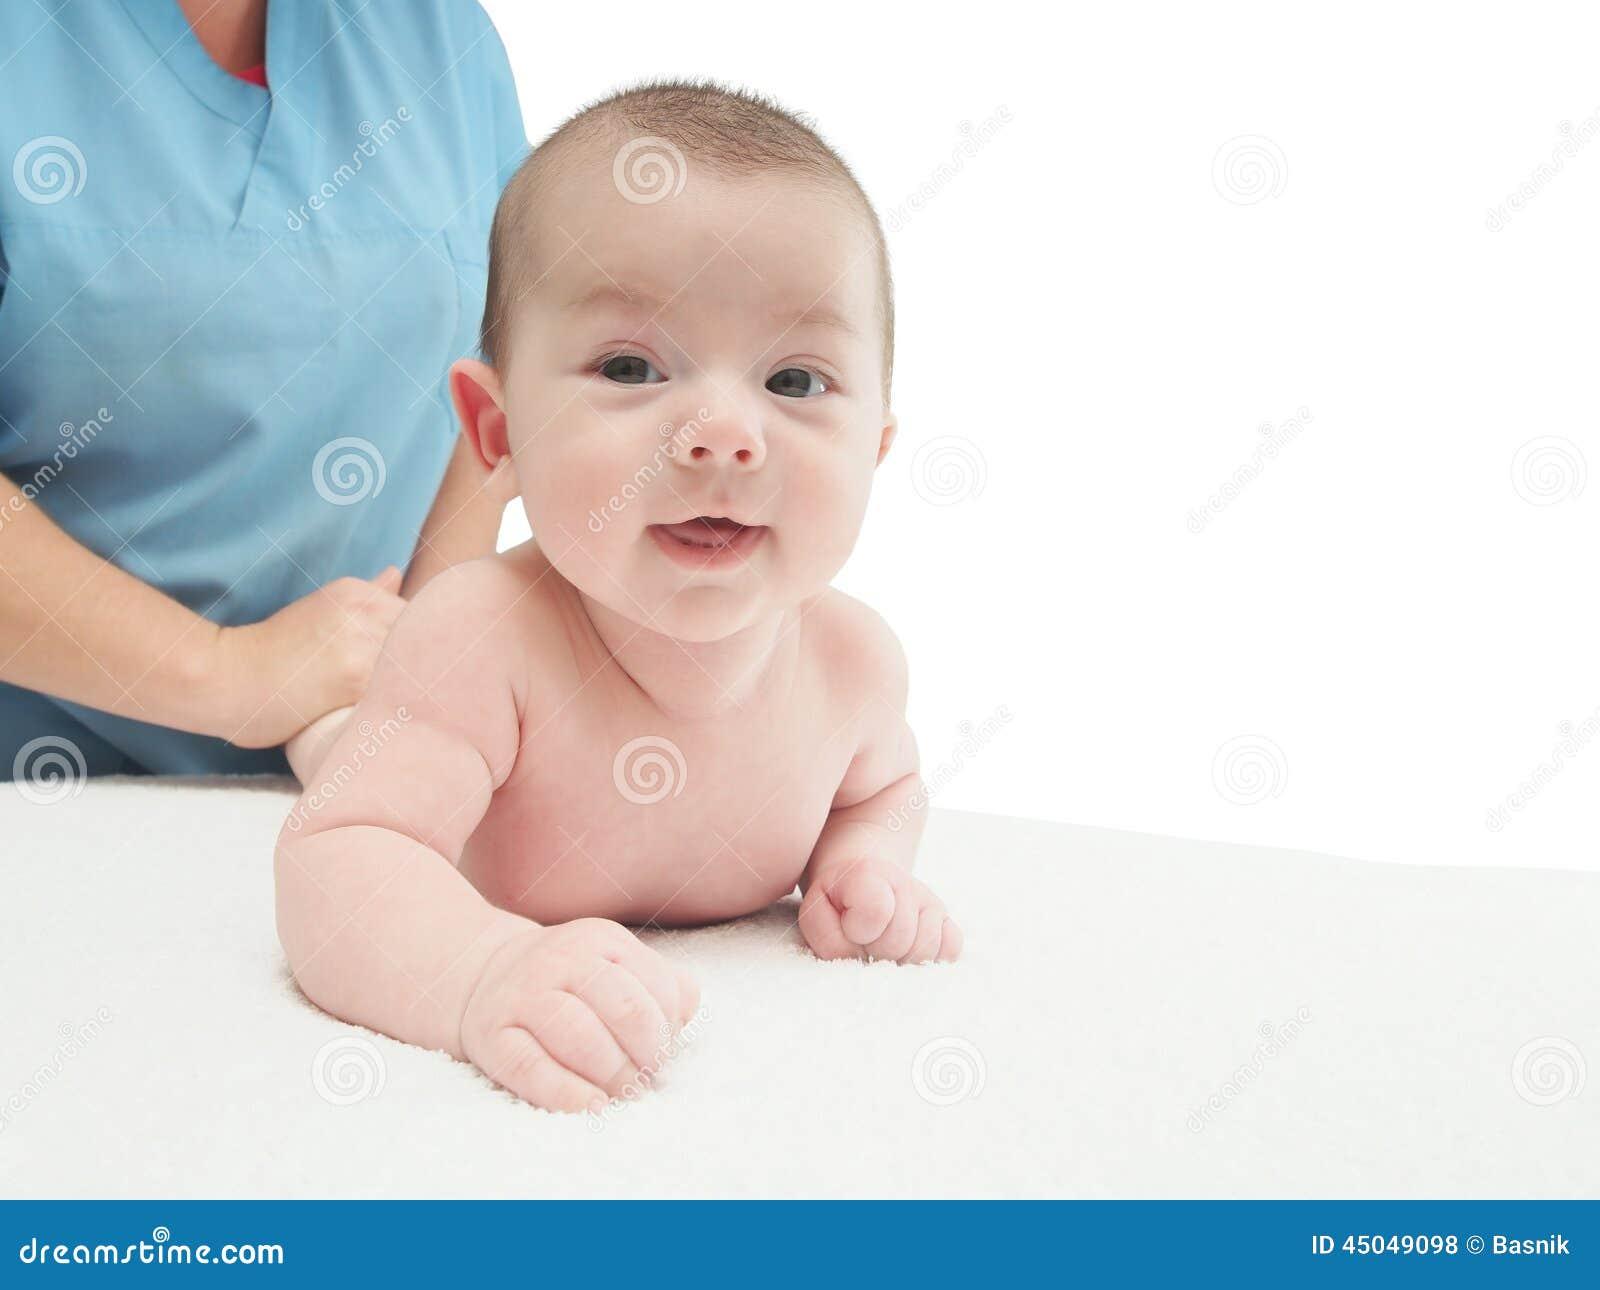 Doctor massage small caucasian baby